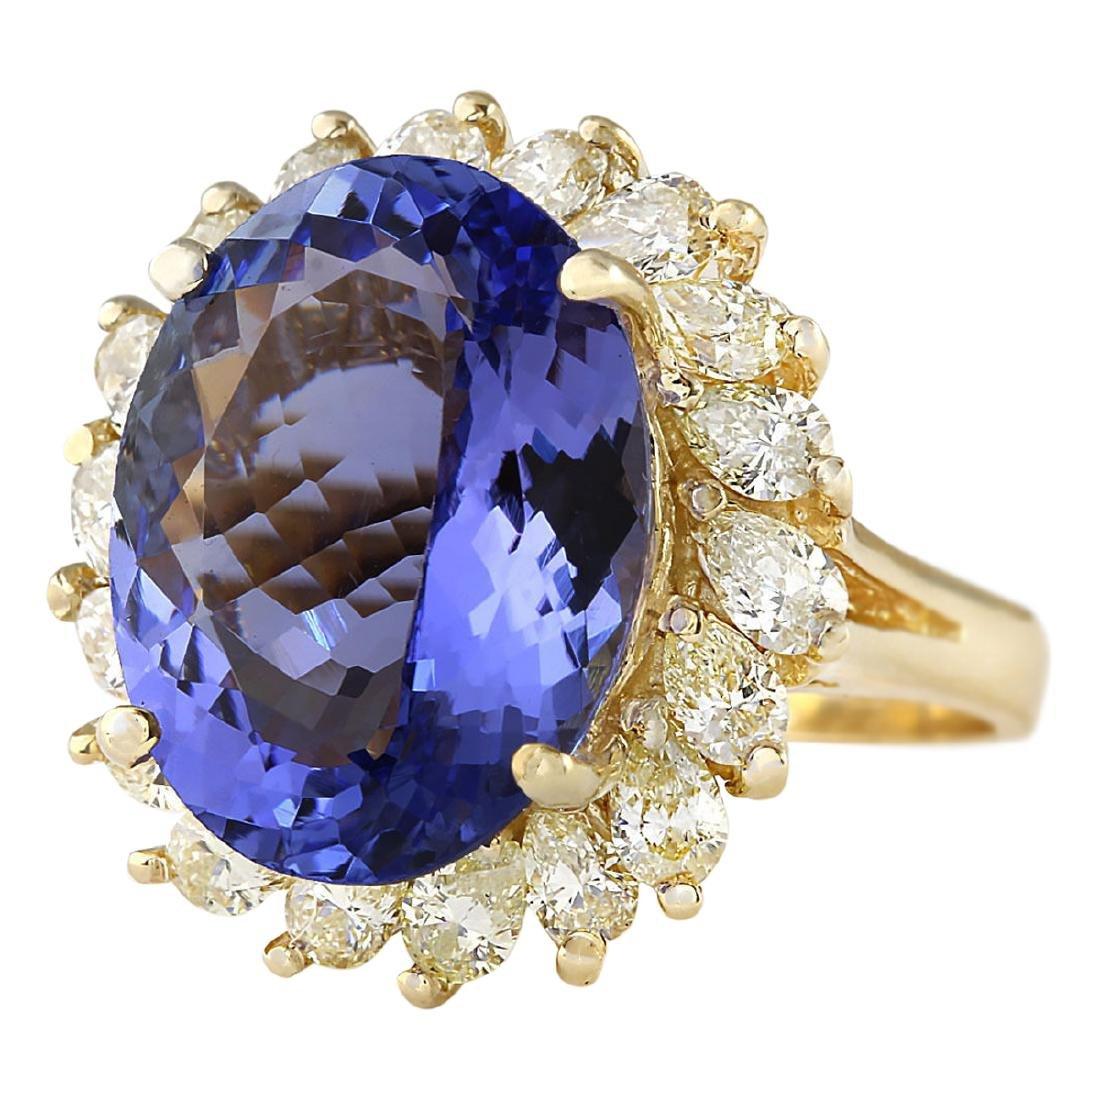 11.97 CTW Natural Tanzanite And Diamond Ring In 18K - 2